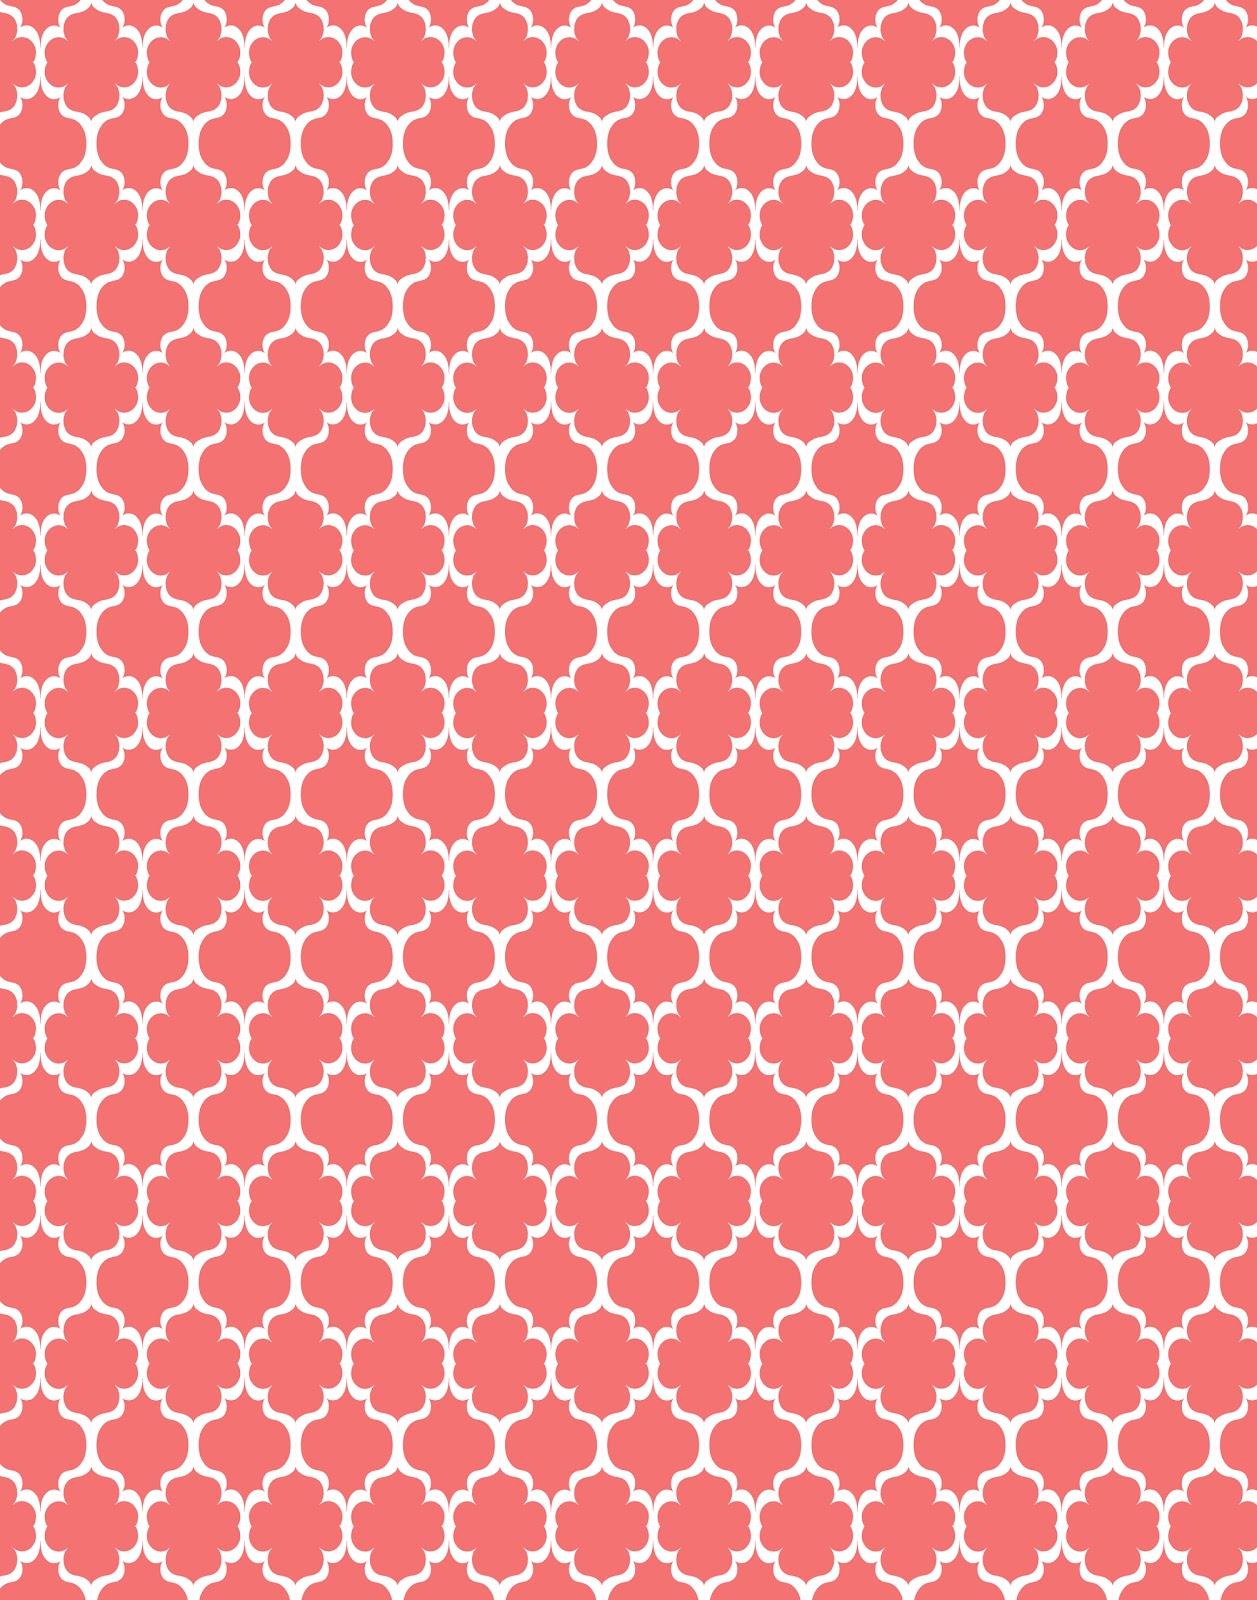 quatrefoil pattern background - photo #19